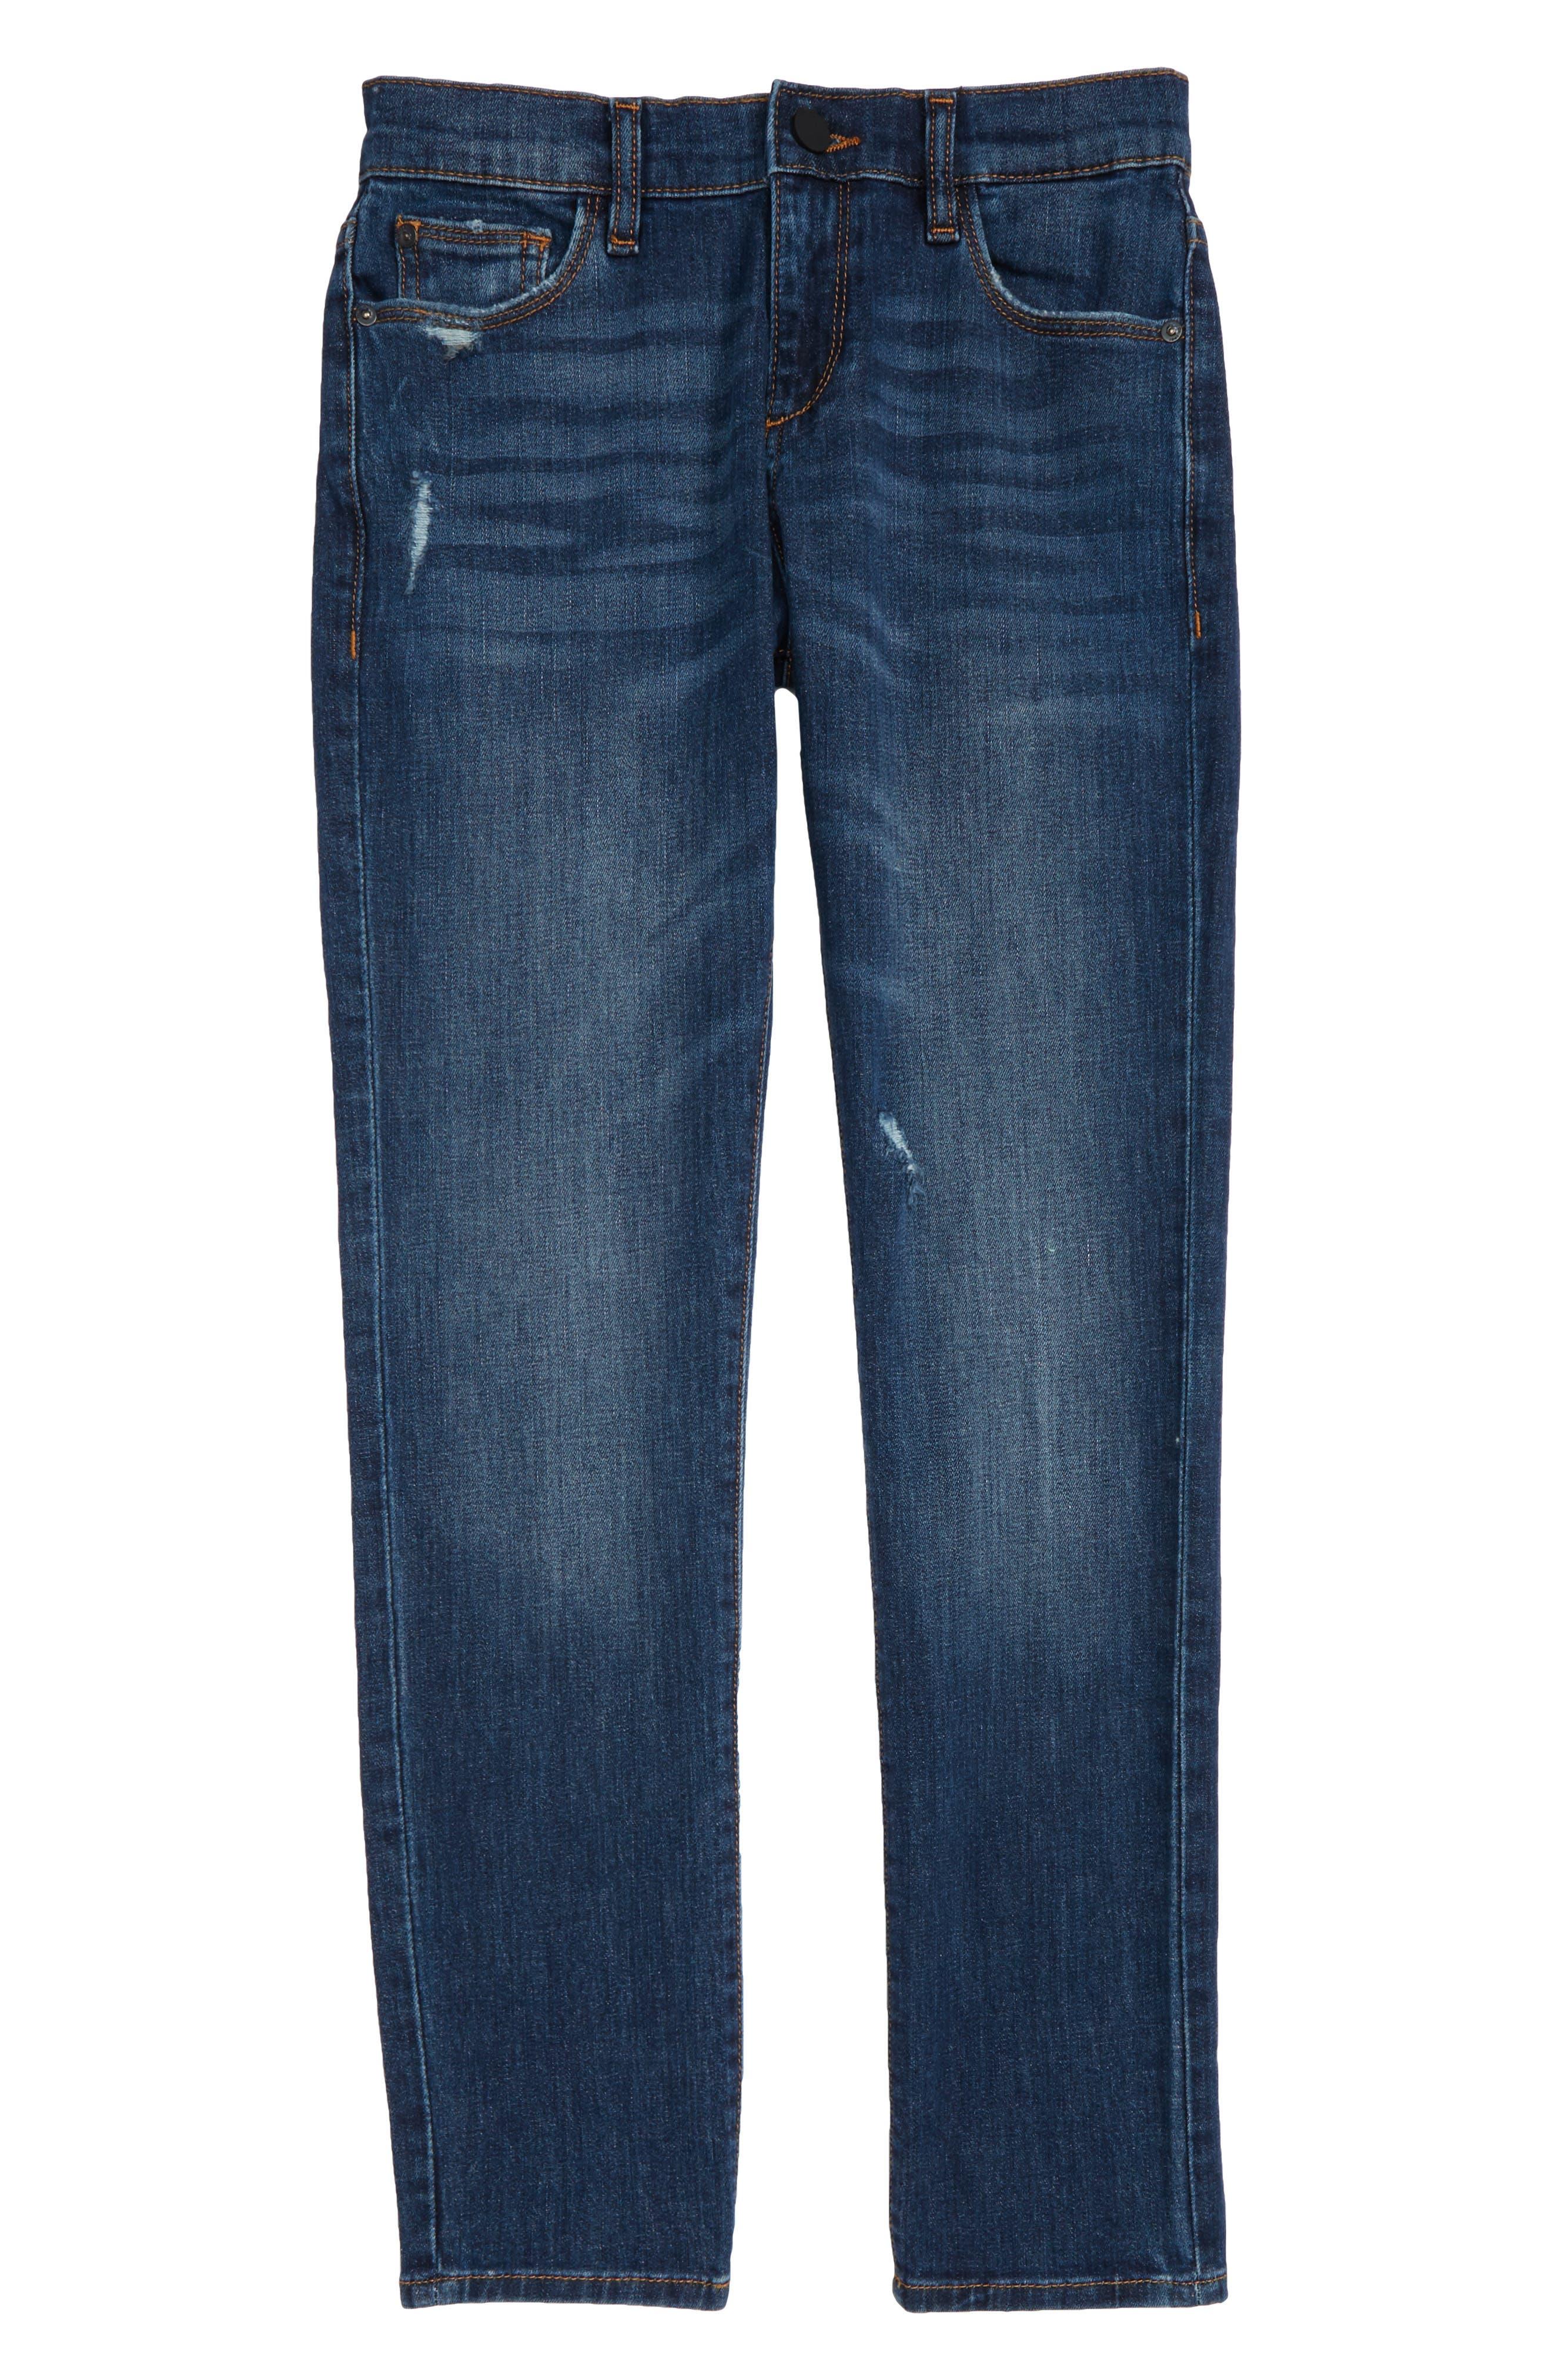 Hawke Skinny Jeans,                             Main thumbnail 1, color,                             425